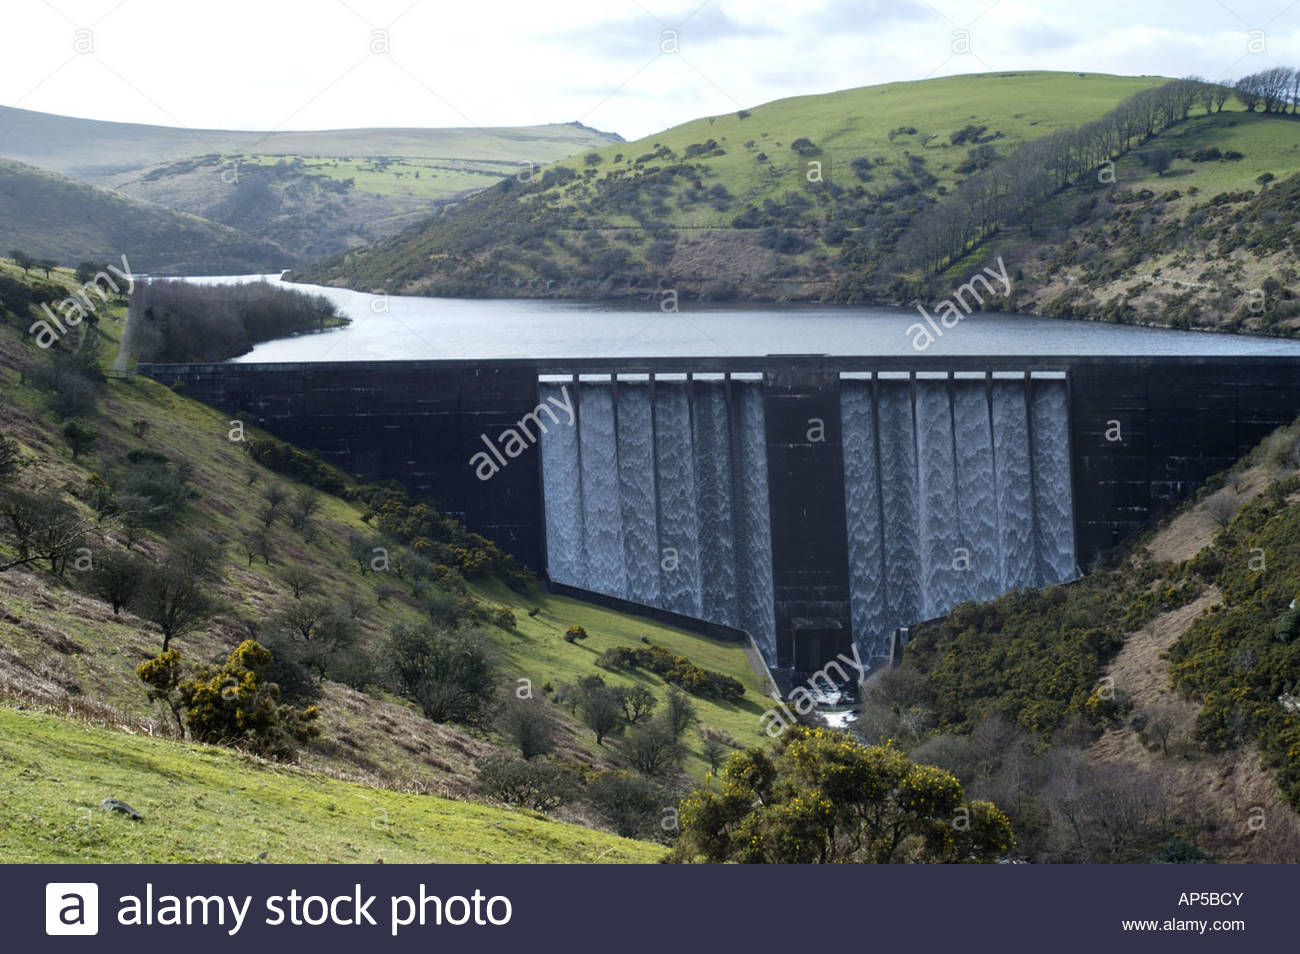 meldon-reservoir-and-dam-in-dartmoor-national-park-devon-england-.jpg